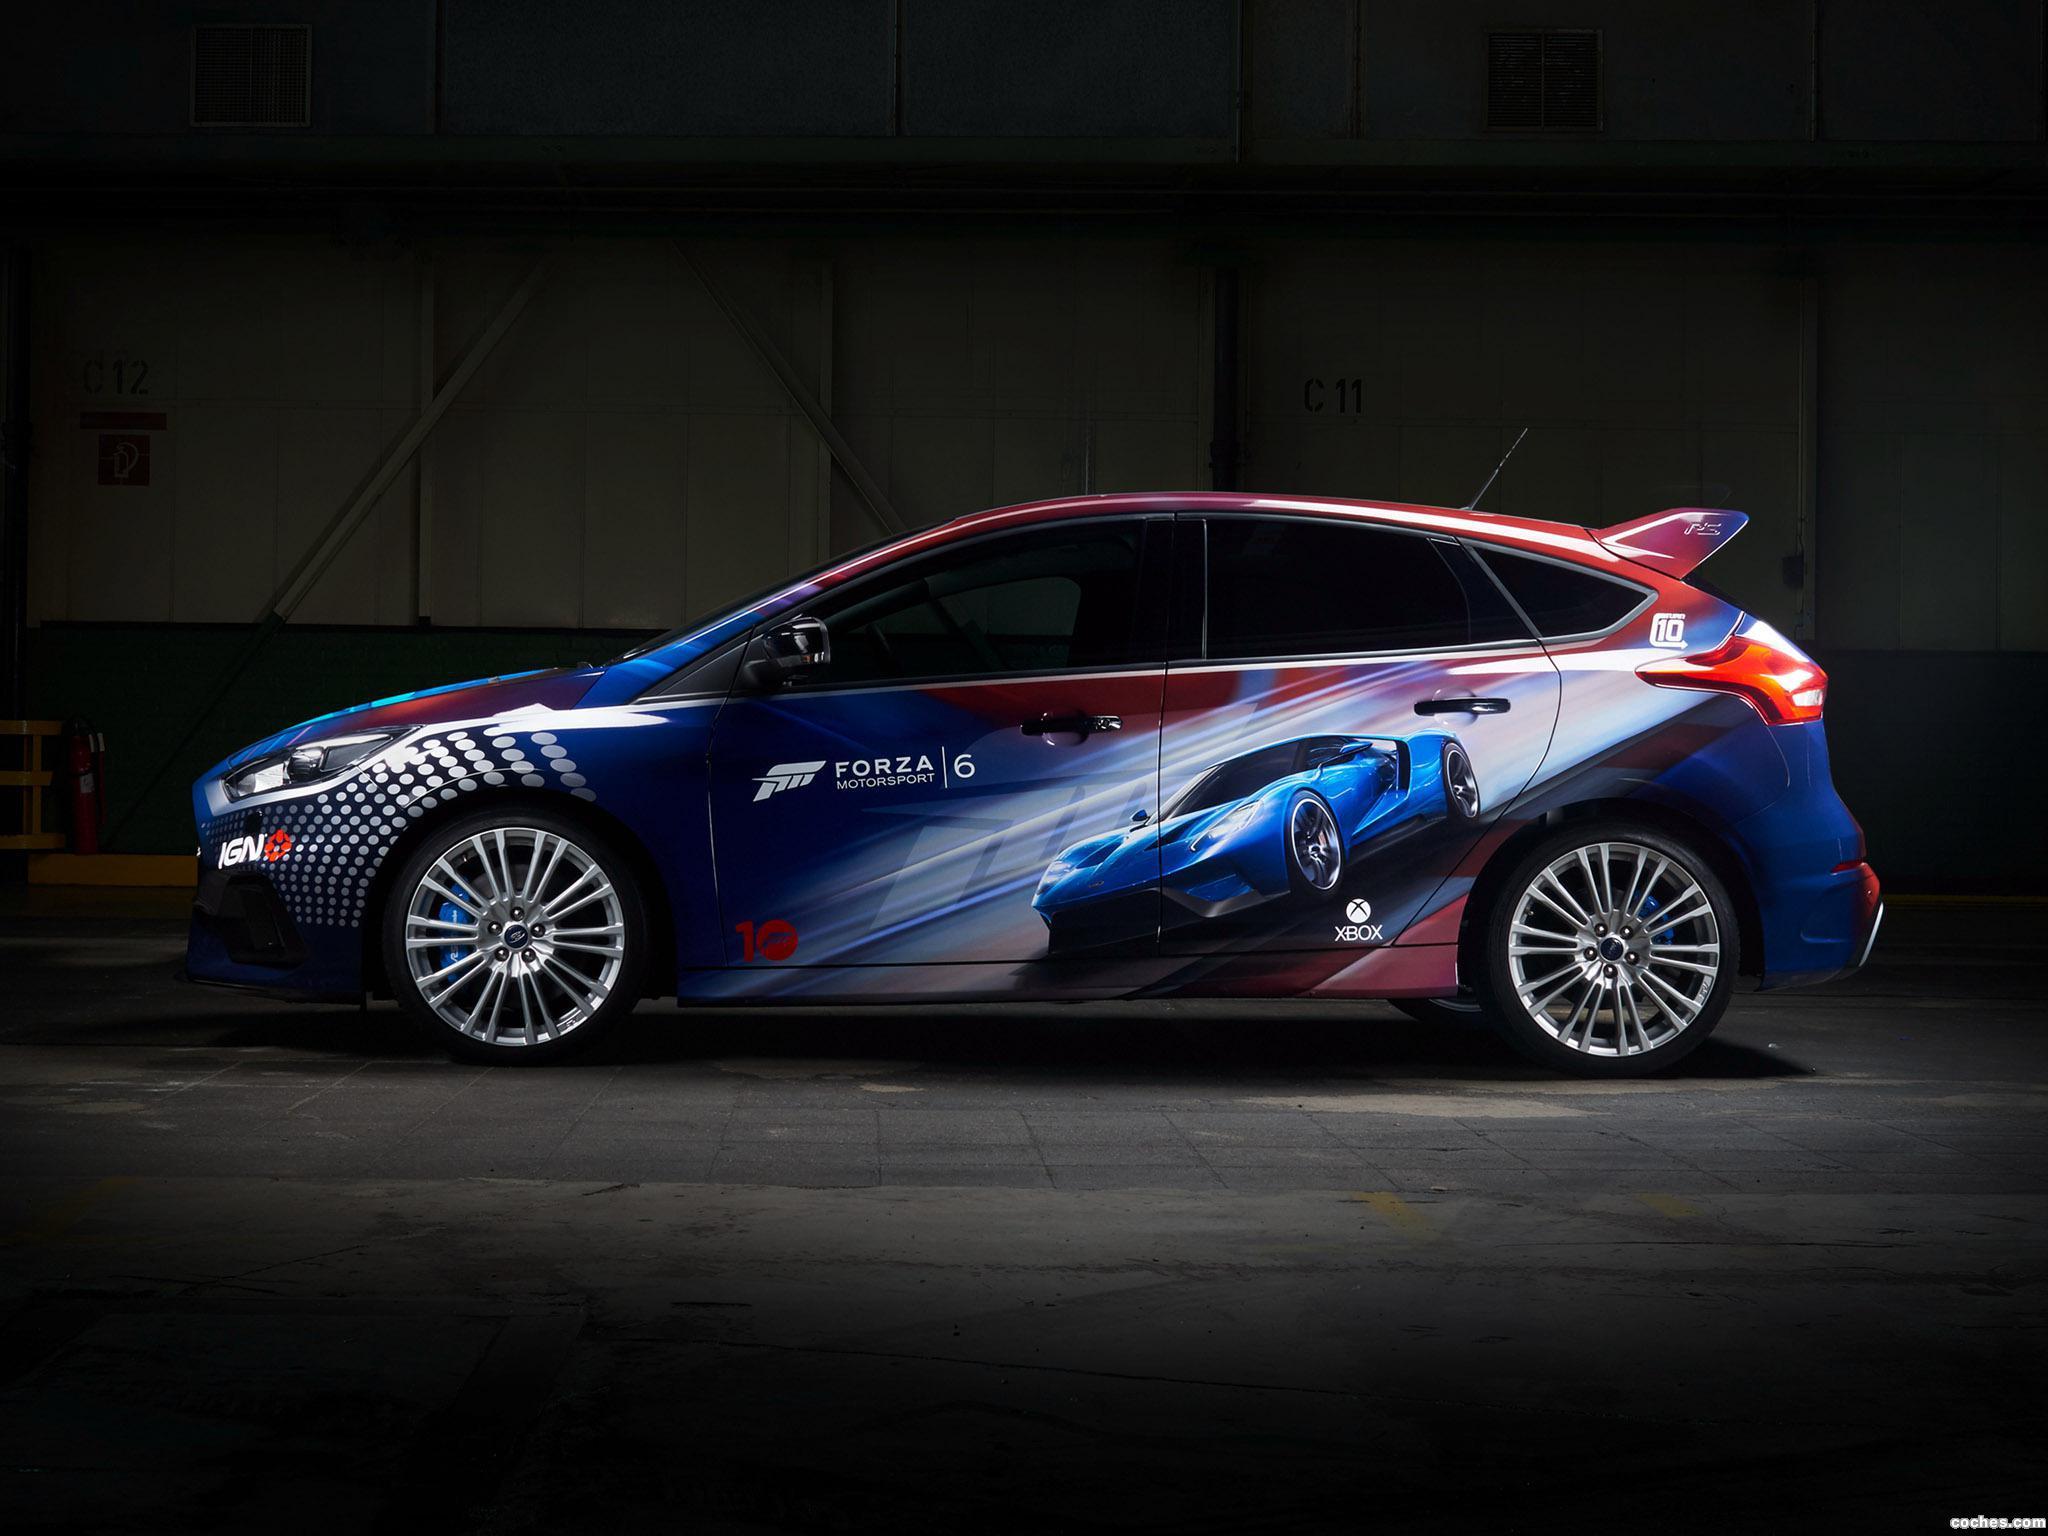 Foto 1 de Ford Focus Forza RS 2015